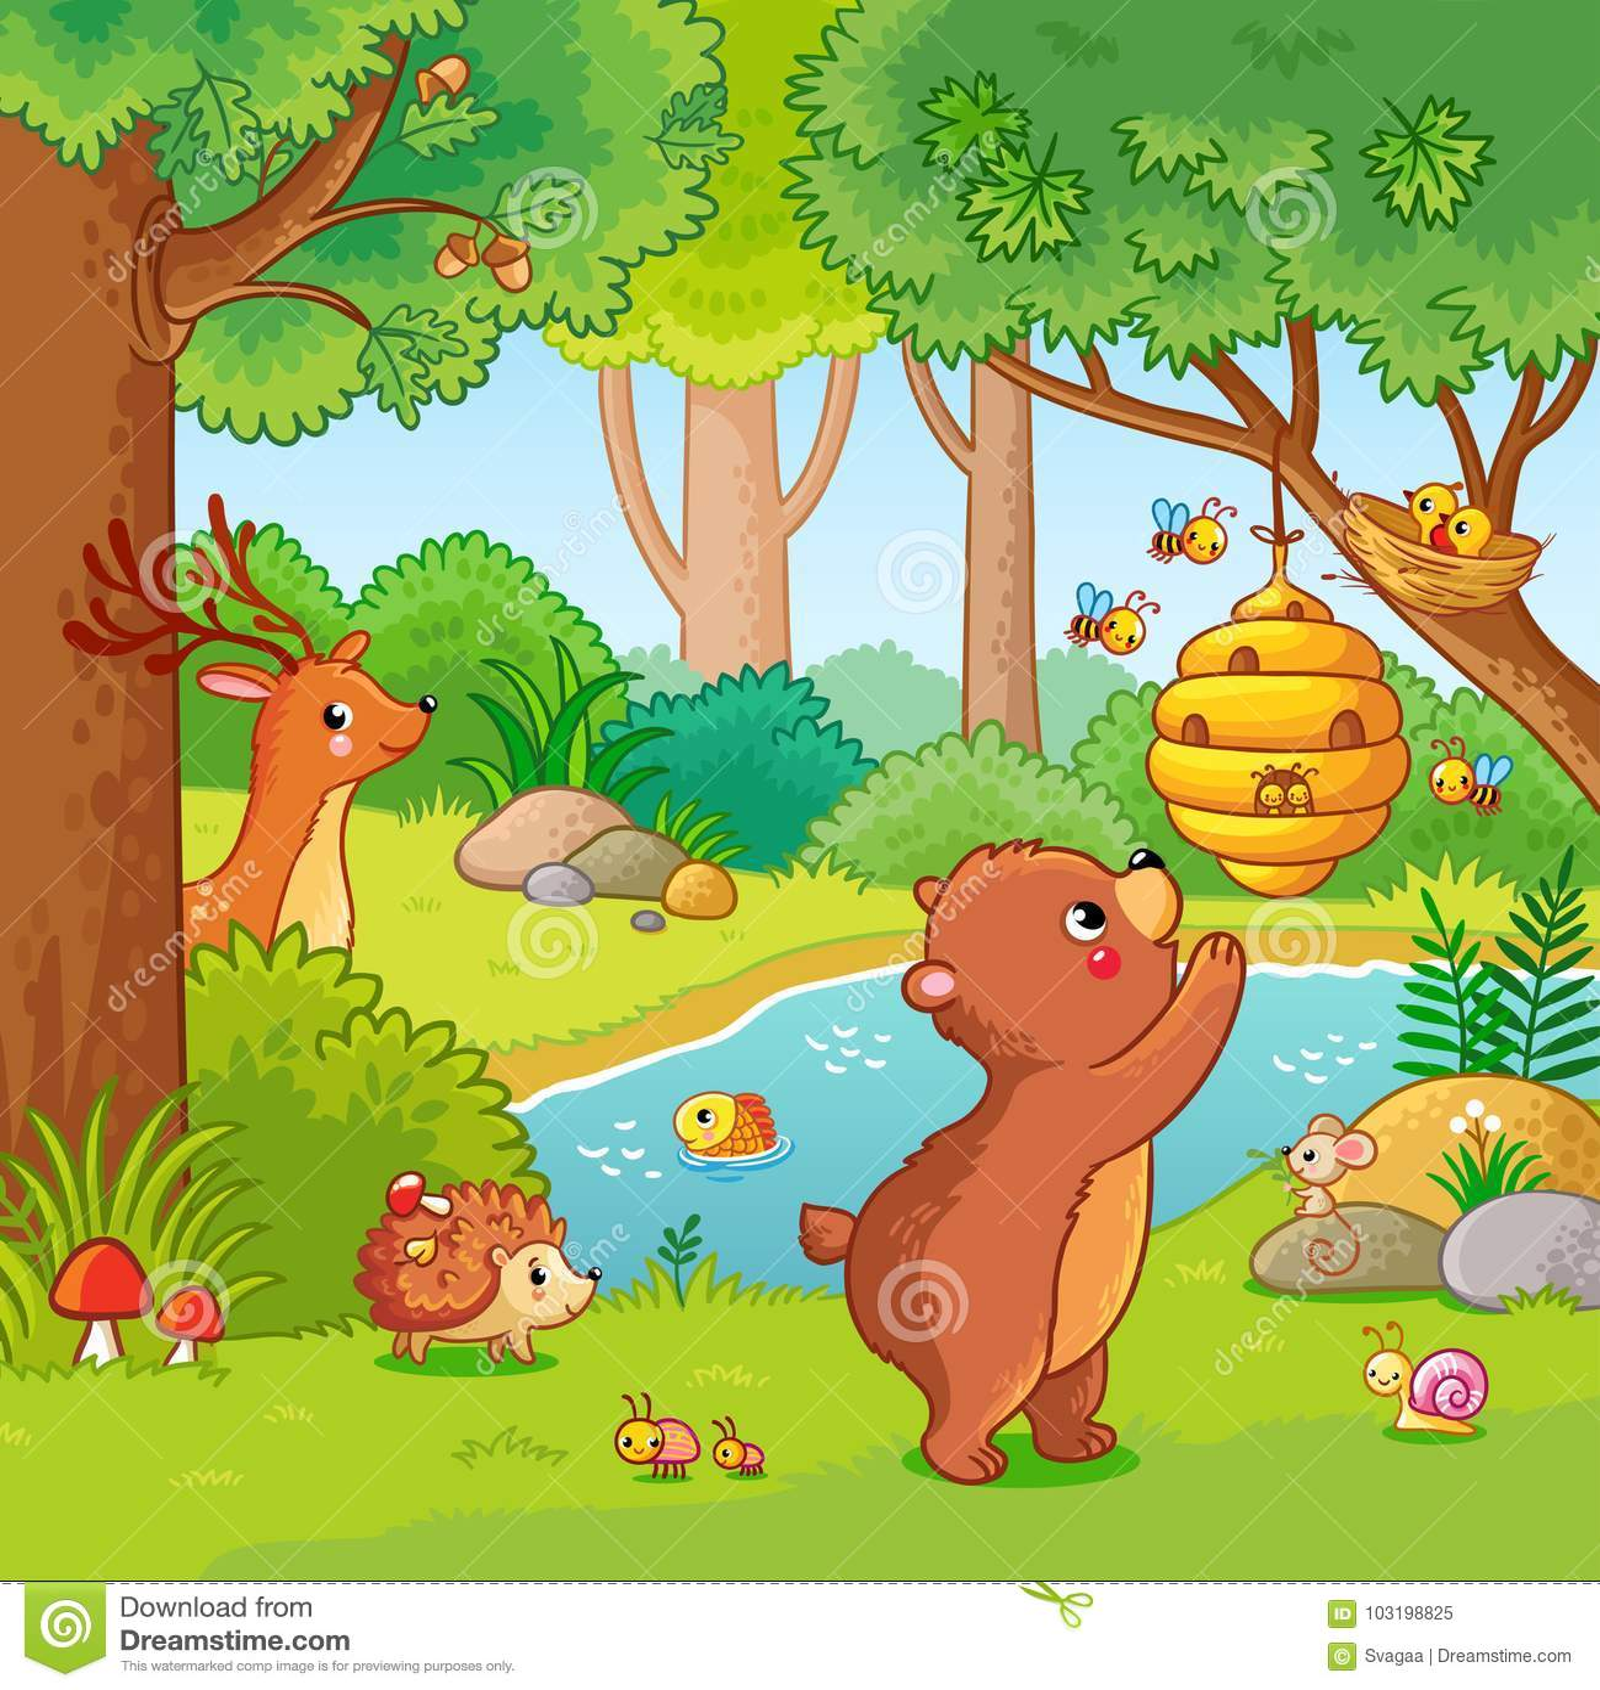 Vector иллюстрация с медведем который хочет мед